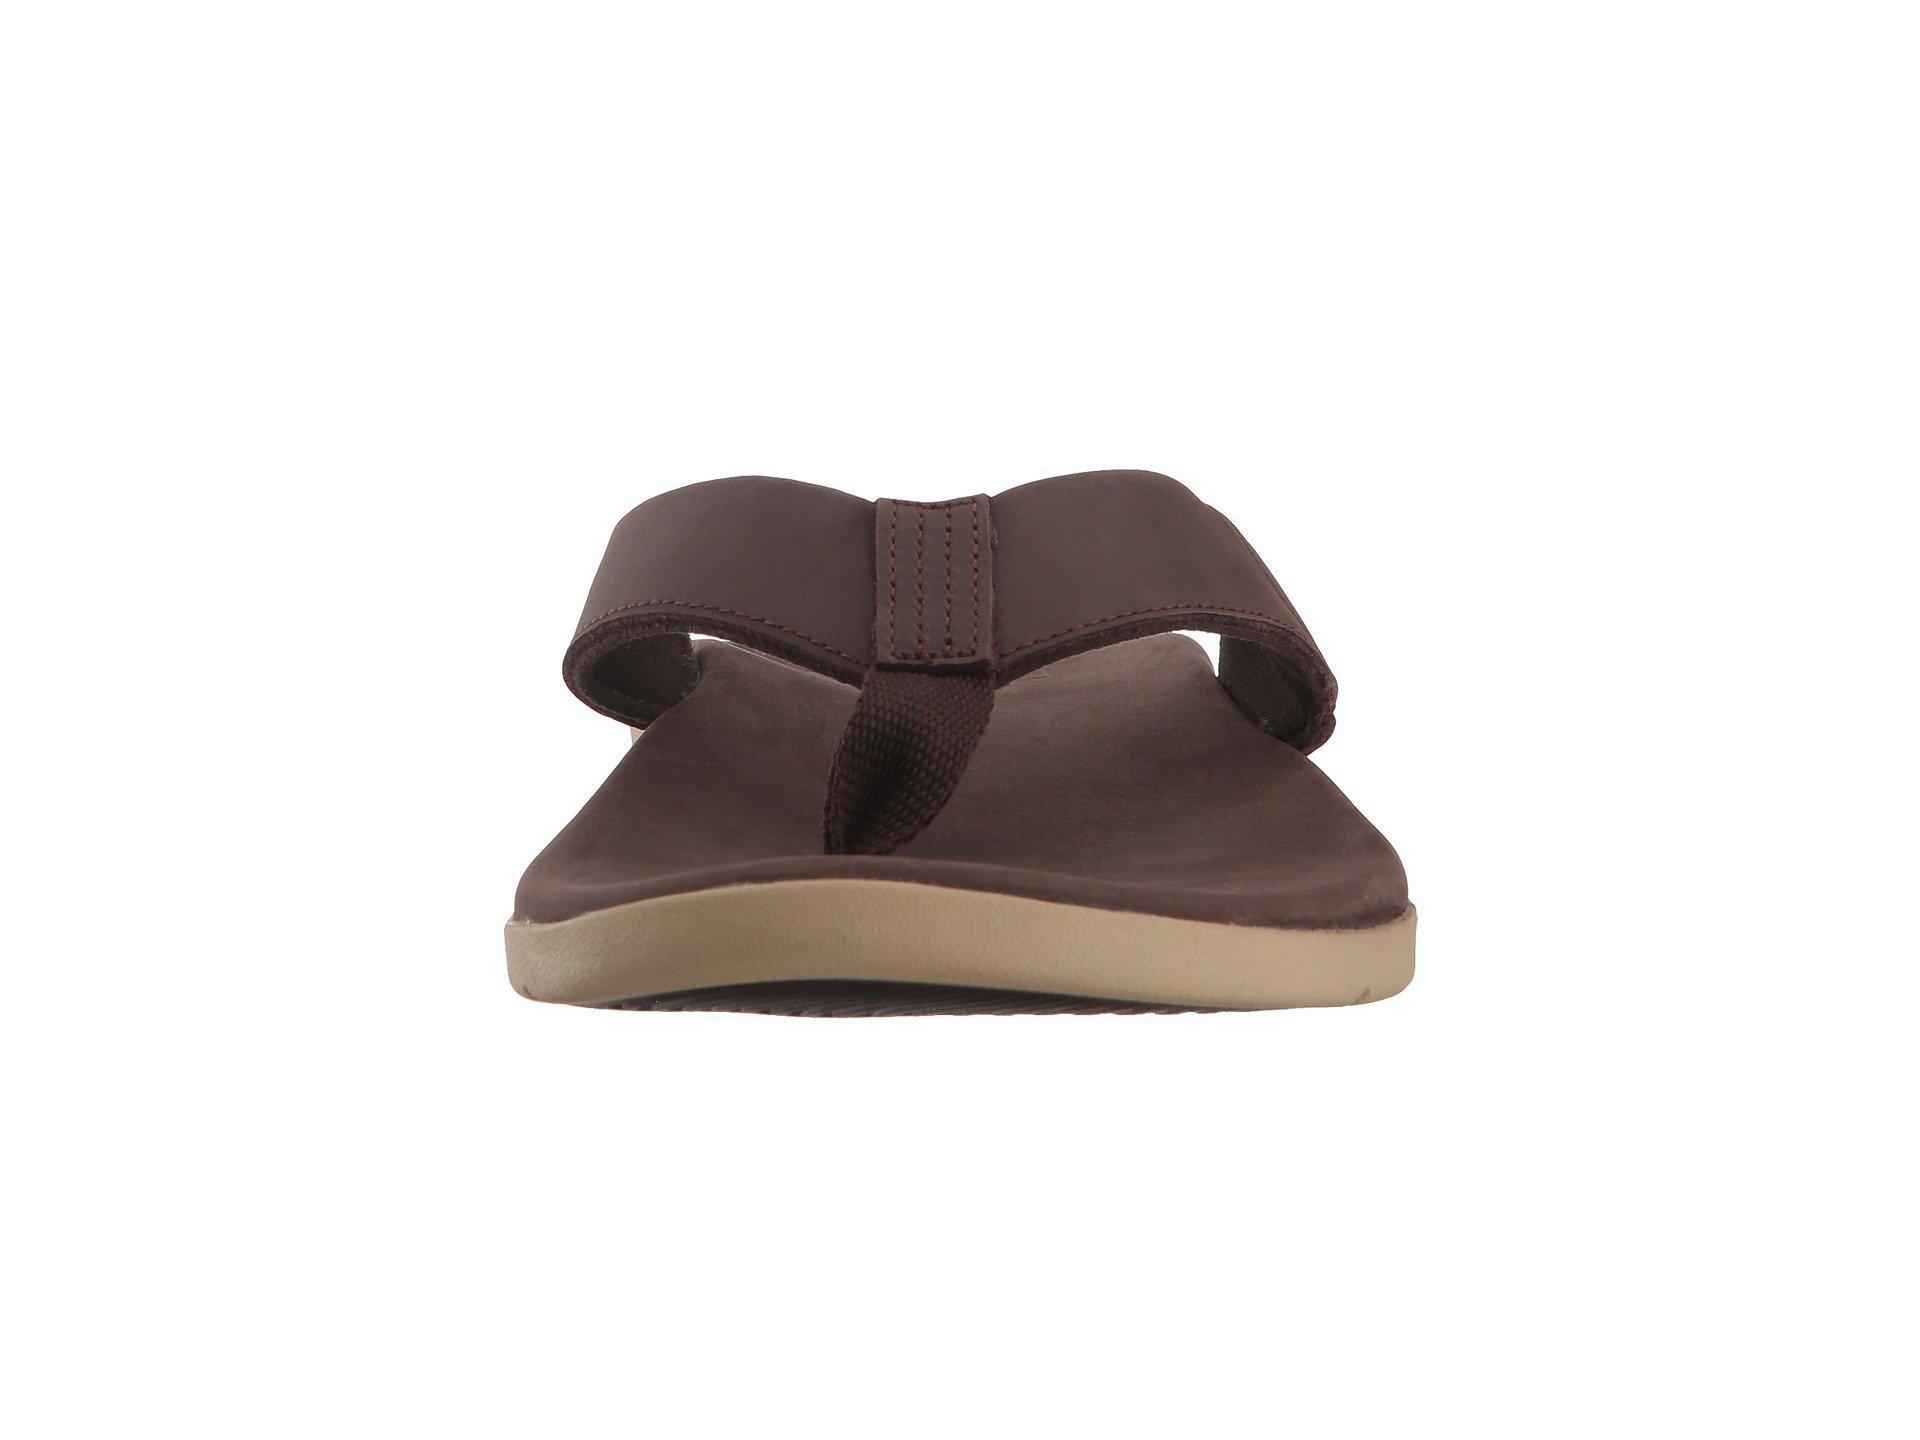 Reef Cushion J Bay Brown Men/'s Leather Flip Flop Sandals